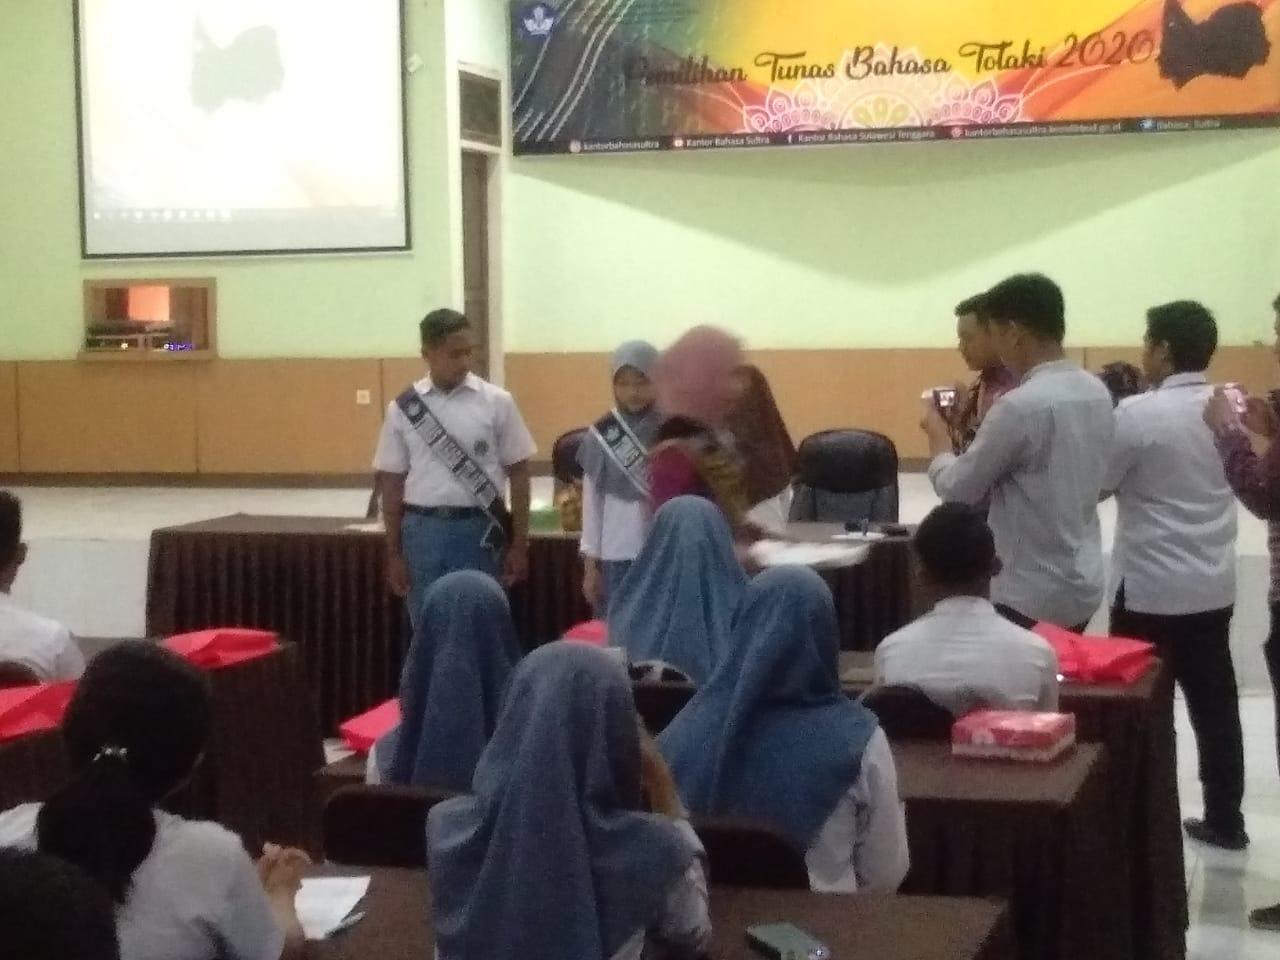 Ketgam : Peserta seleksi Tunas Bahasa Tolaki 2020